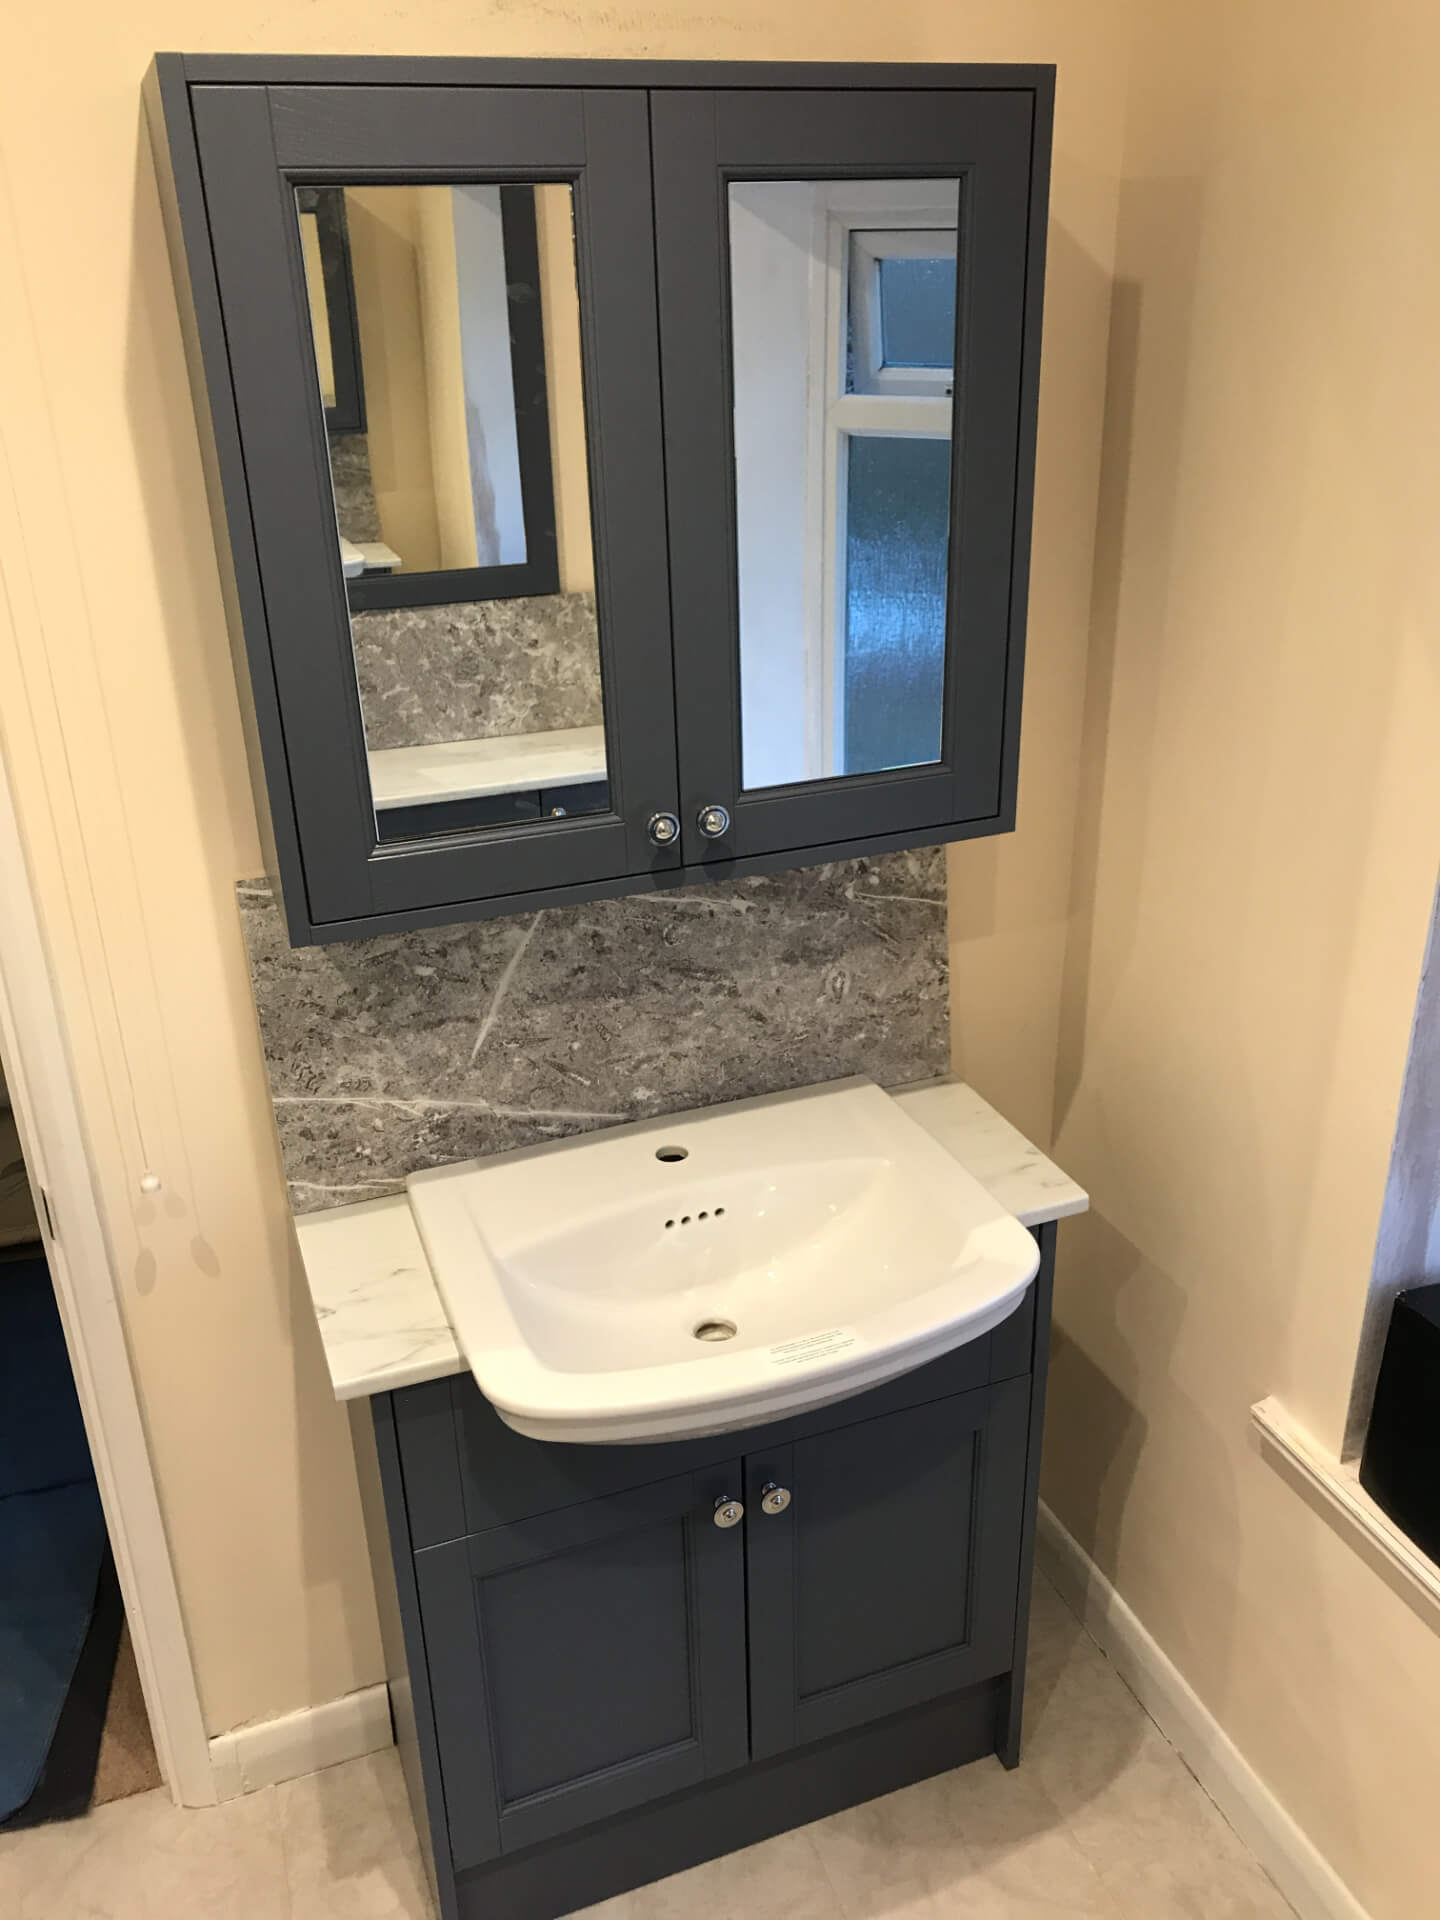 New Sink Unit Installing